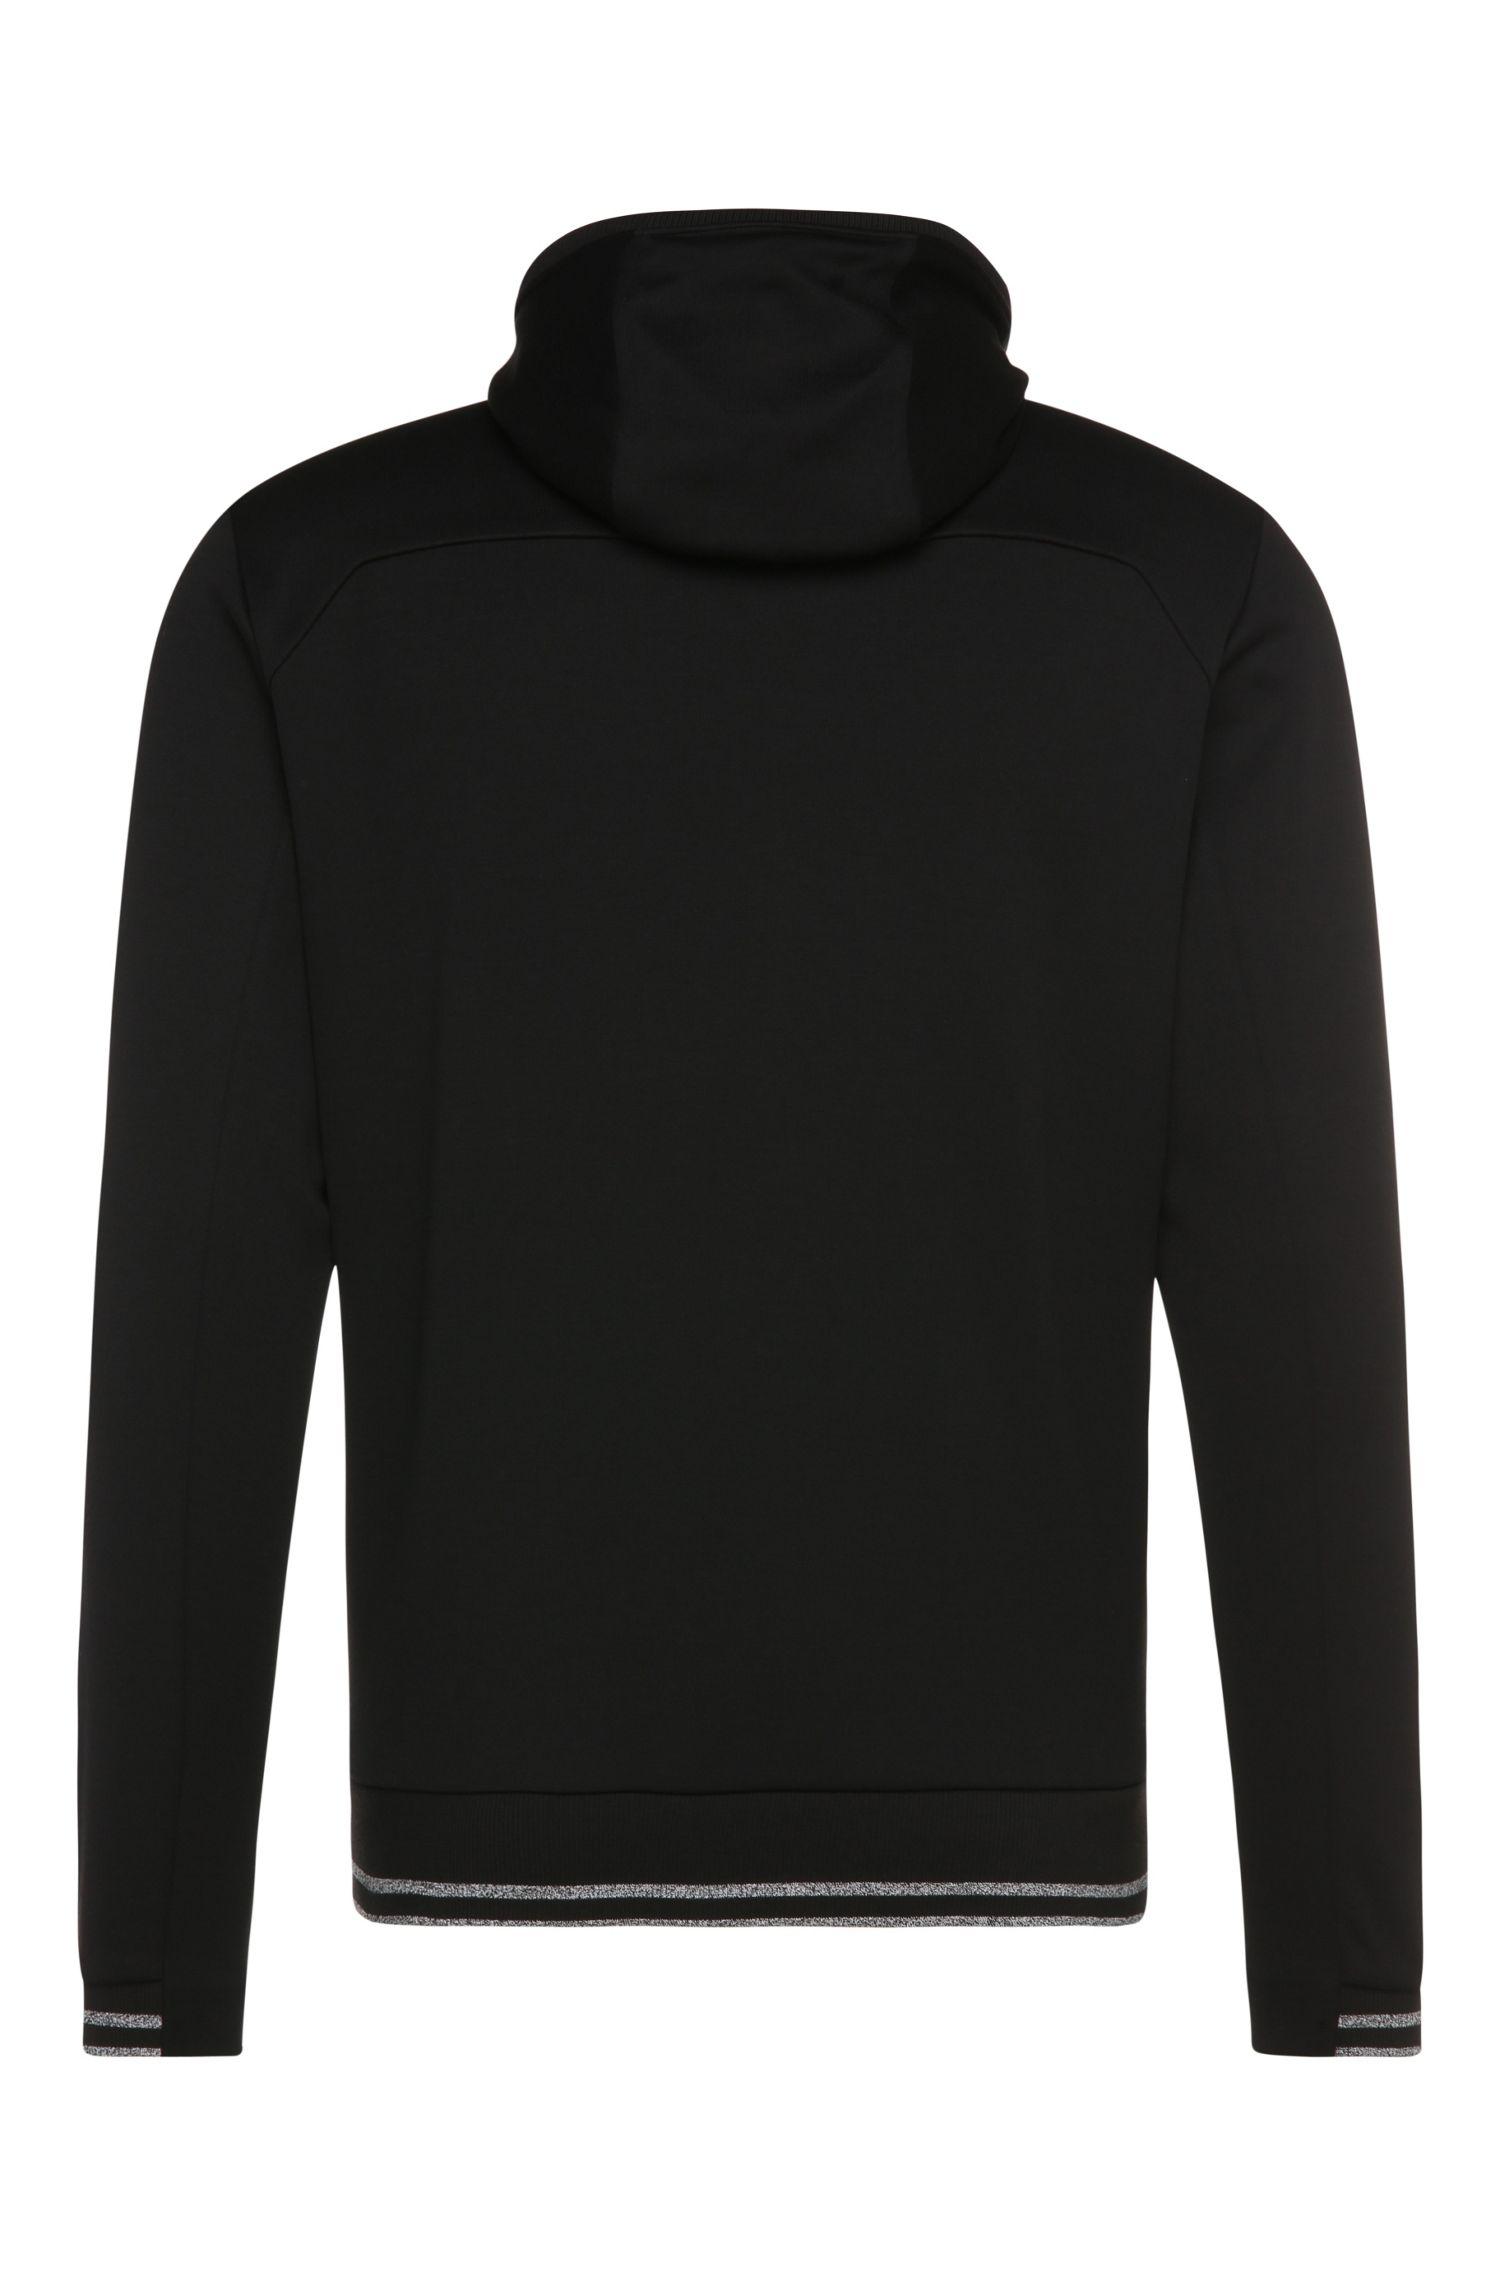 Sweatshirt-Jacke aus Baumwoll-Mix mit Kapuze: ´Saggy`